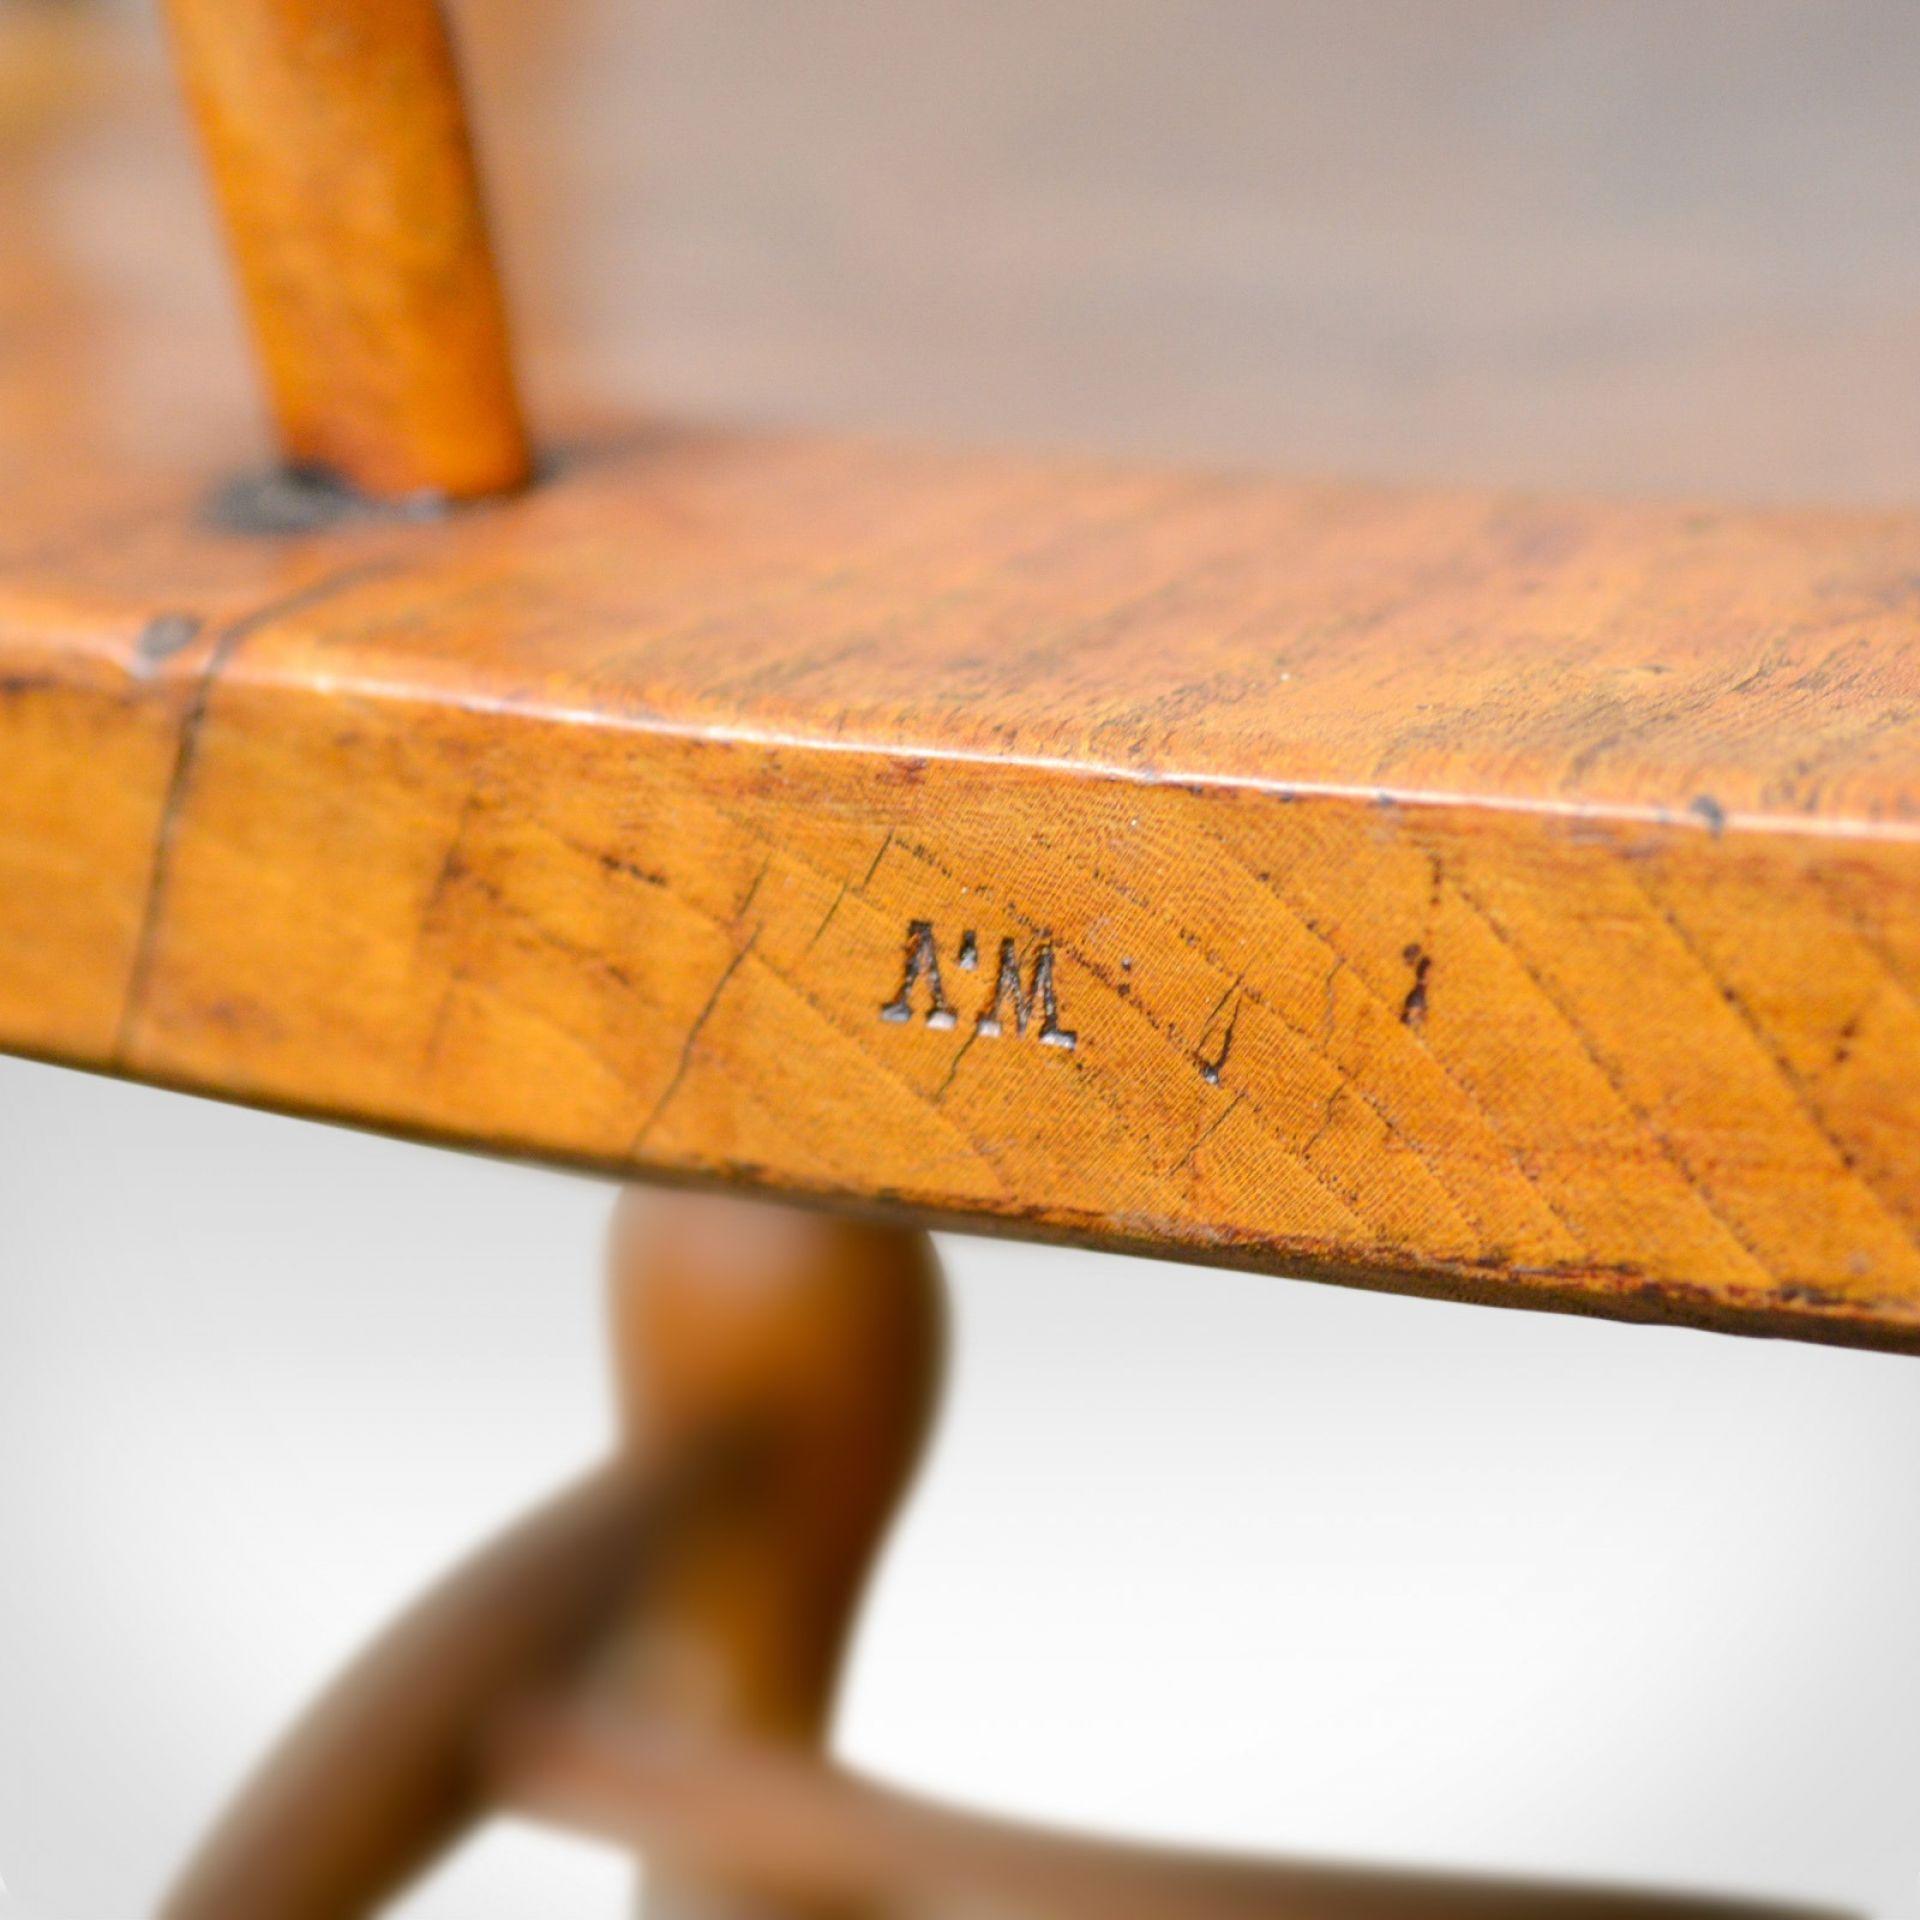 Antique Bow-Back Elbow Chair, English, Victorian, Smokers, Captains, Circa 1890